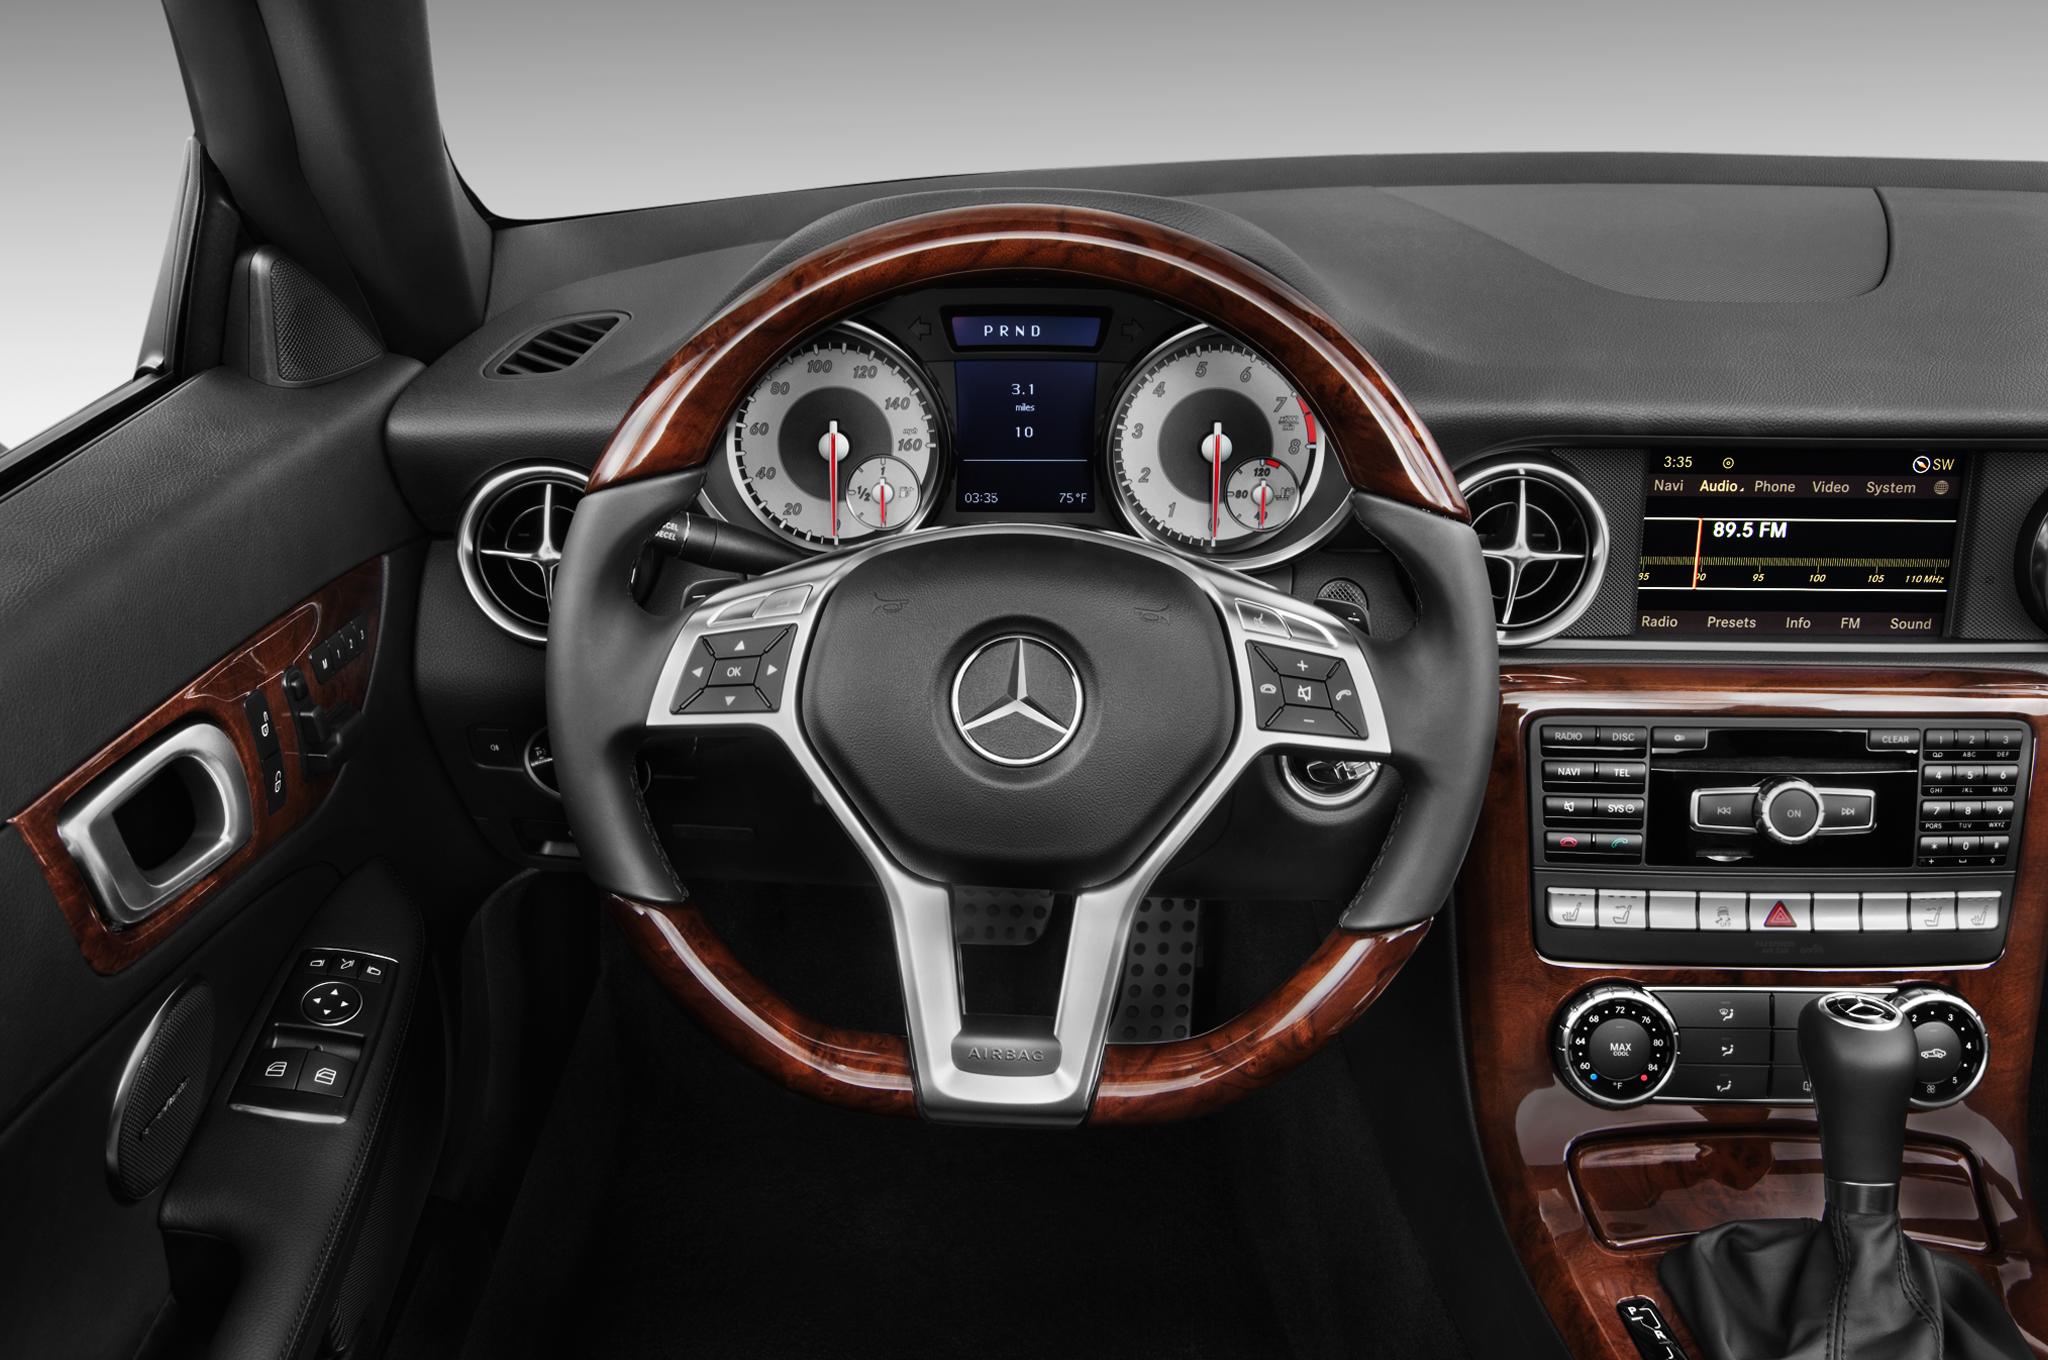 2012 Mercedes Benz Slk350 Editors Notebook Automobile Magazine 2011 Glk 350 Engine Diagrams 17 25